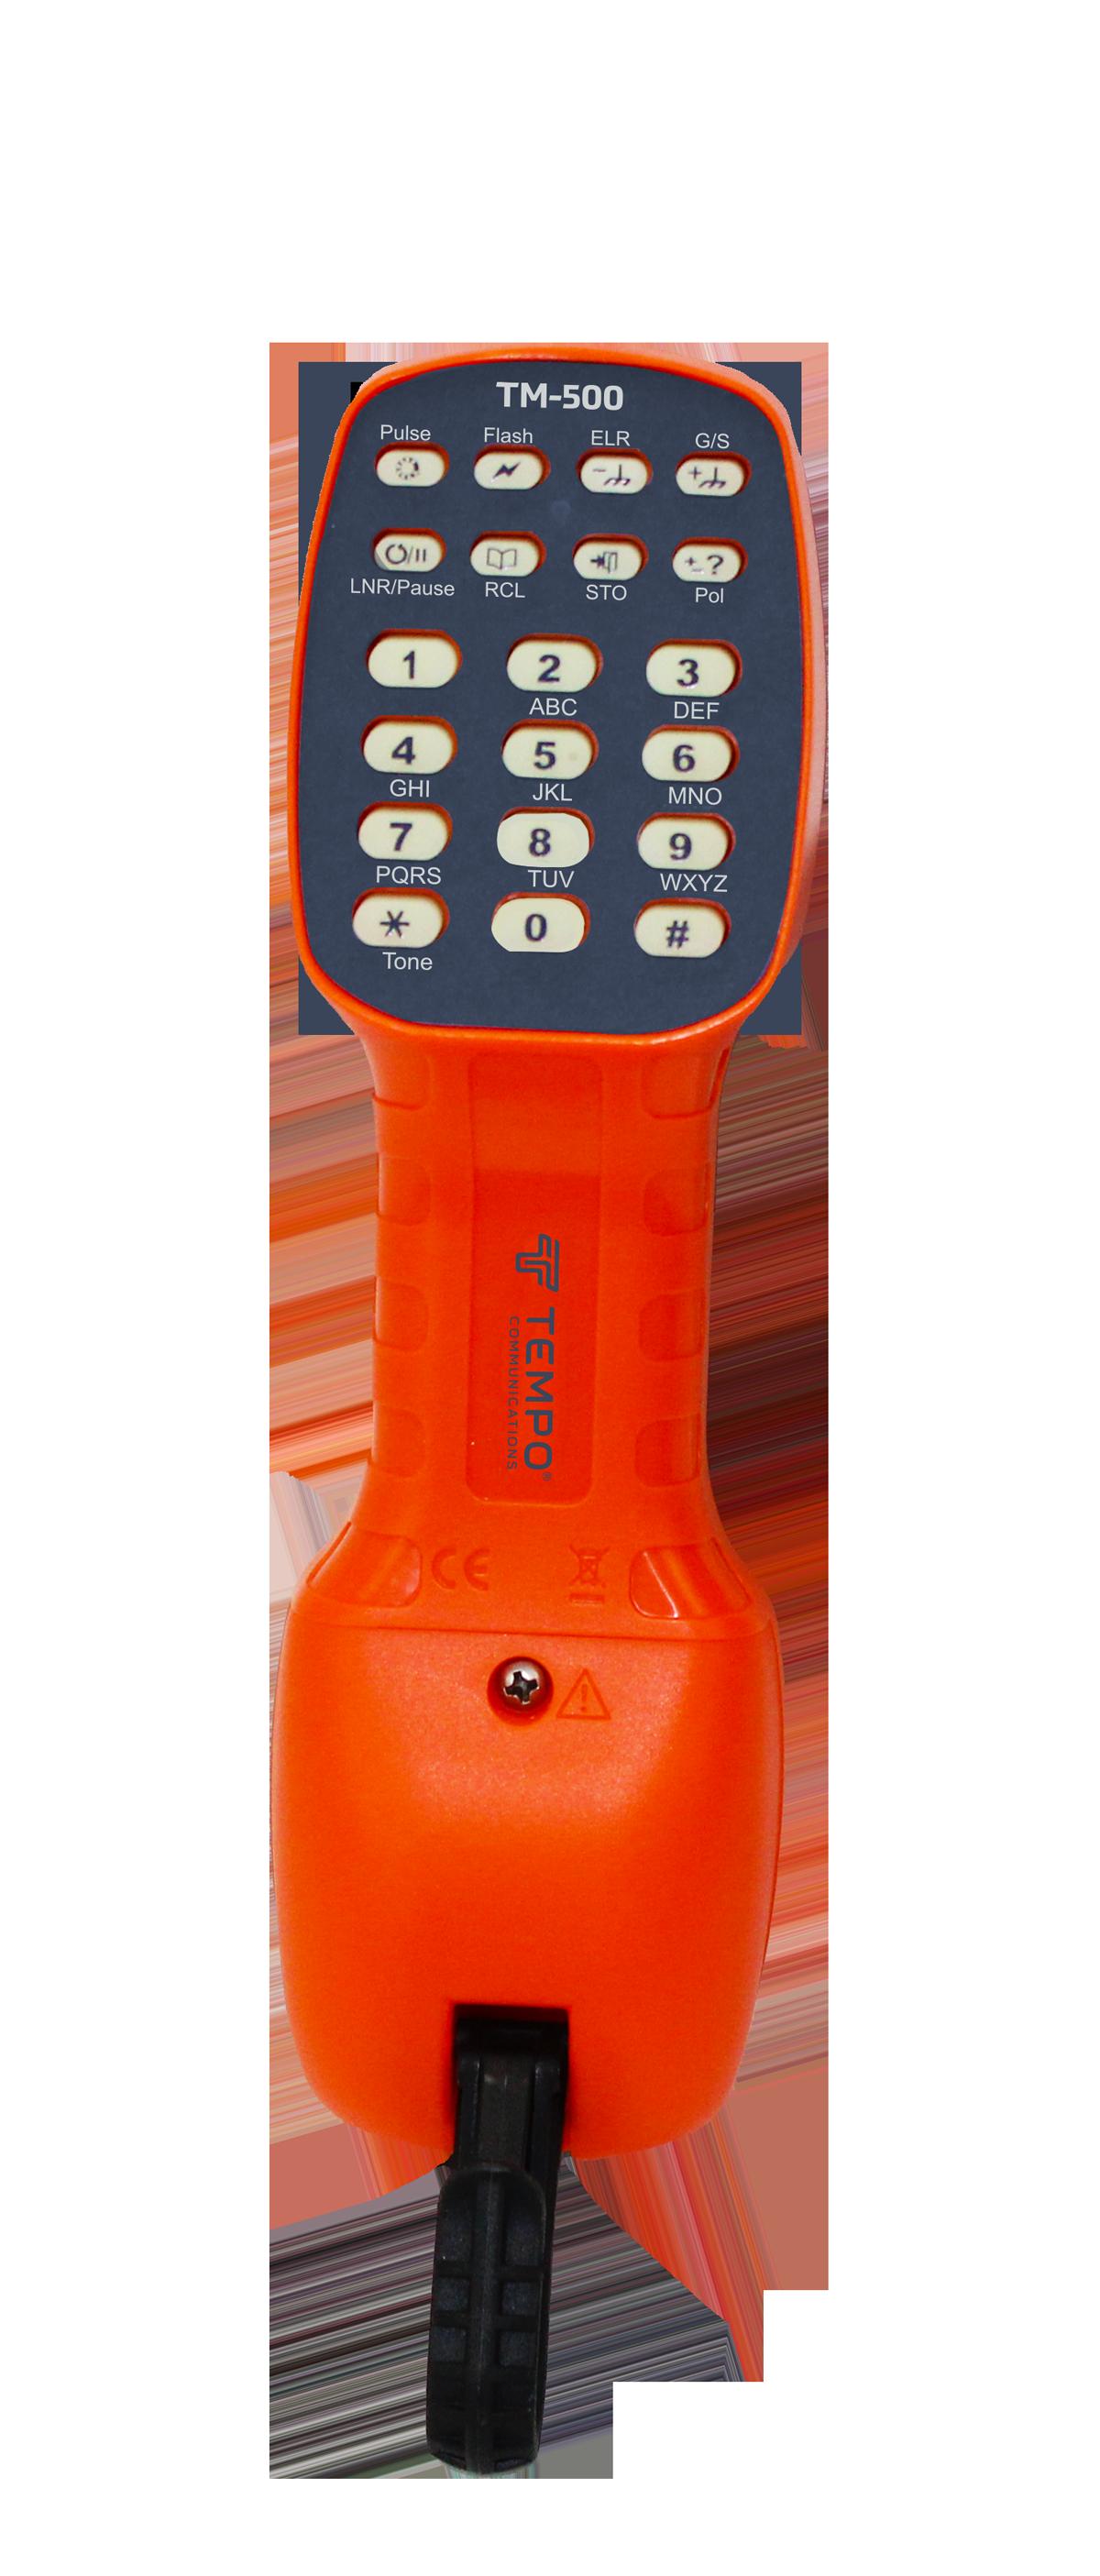 TM-500 Tele-Mate Telephone Test Set